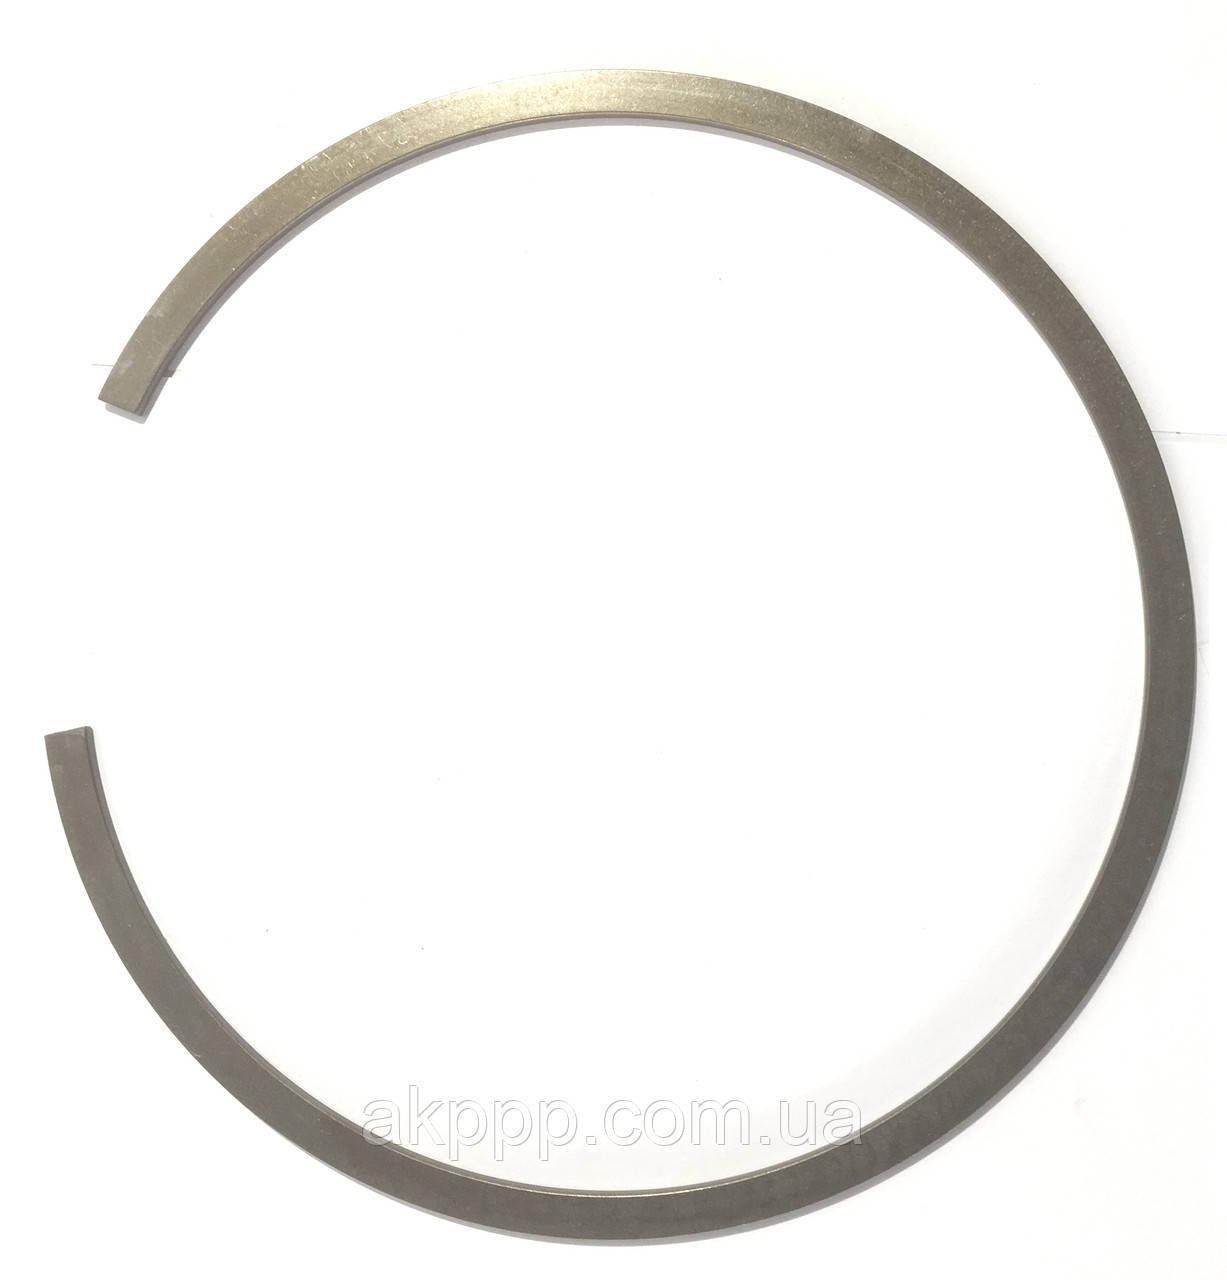 Стопорное кольцо акпп 6T40E/6T45E пакета 1-2-3-4 Low Reverse, снято с новой коробки